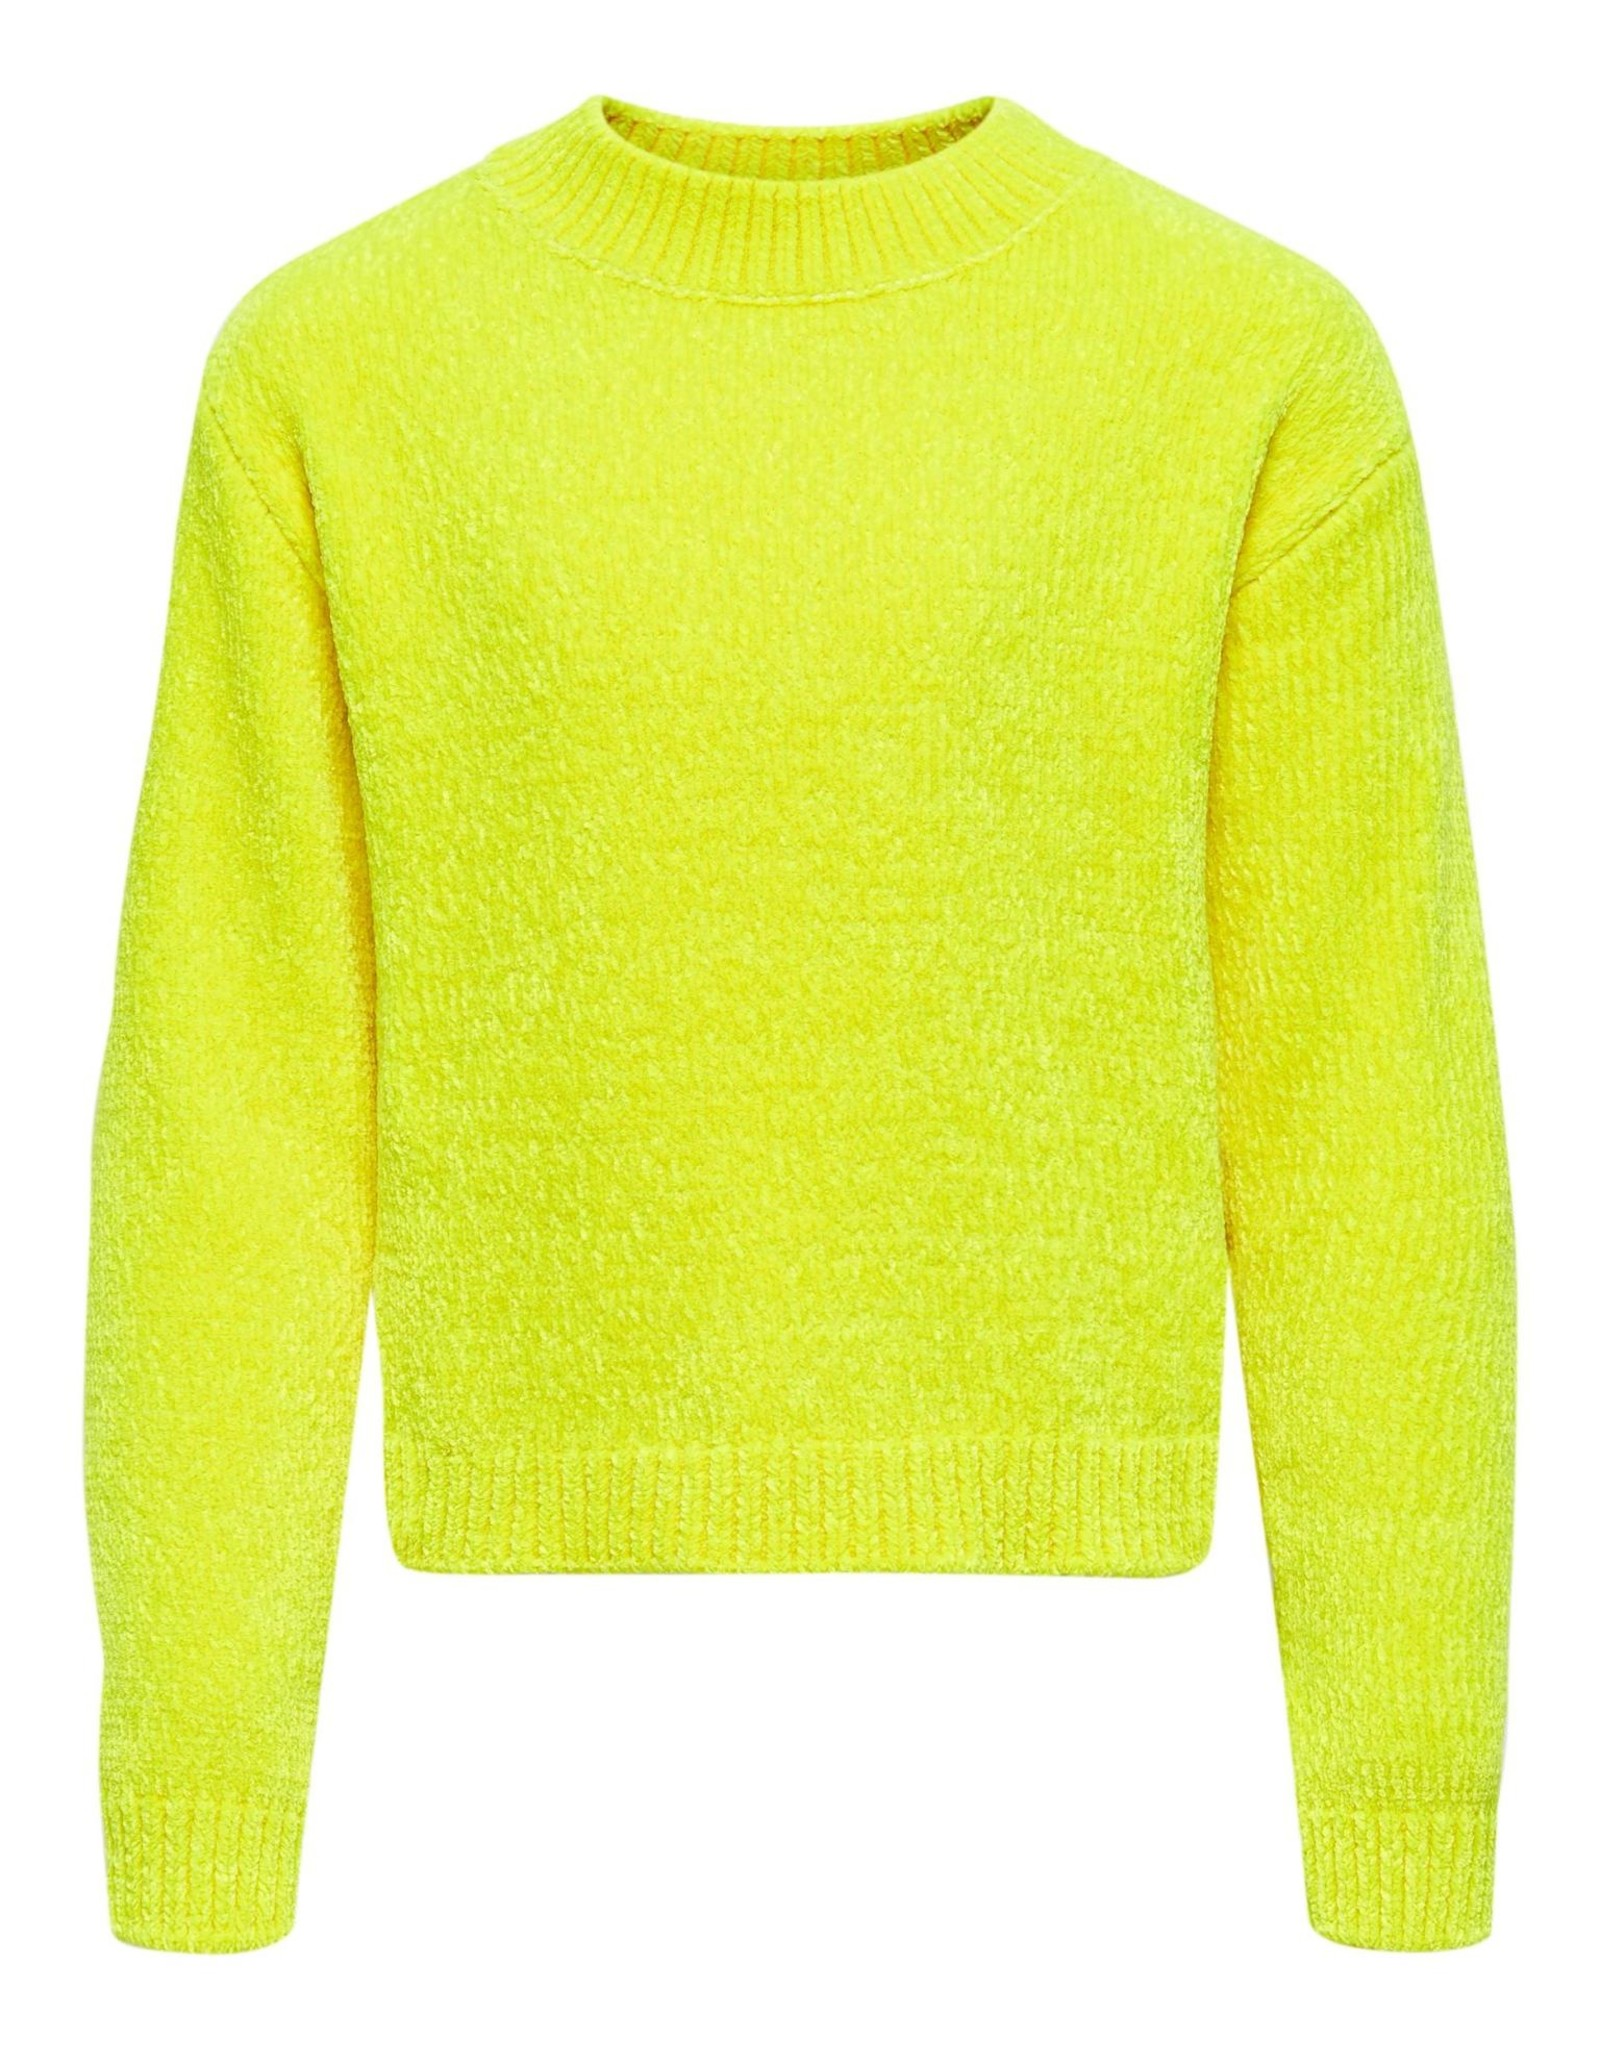 KONANCIA L/S SHORT PULLOVER KNT Safety Yellow